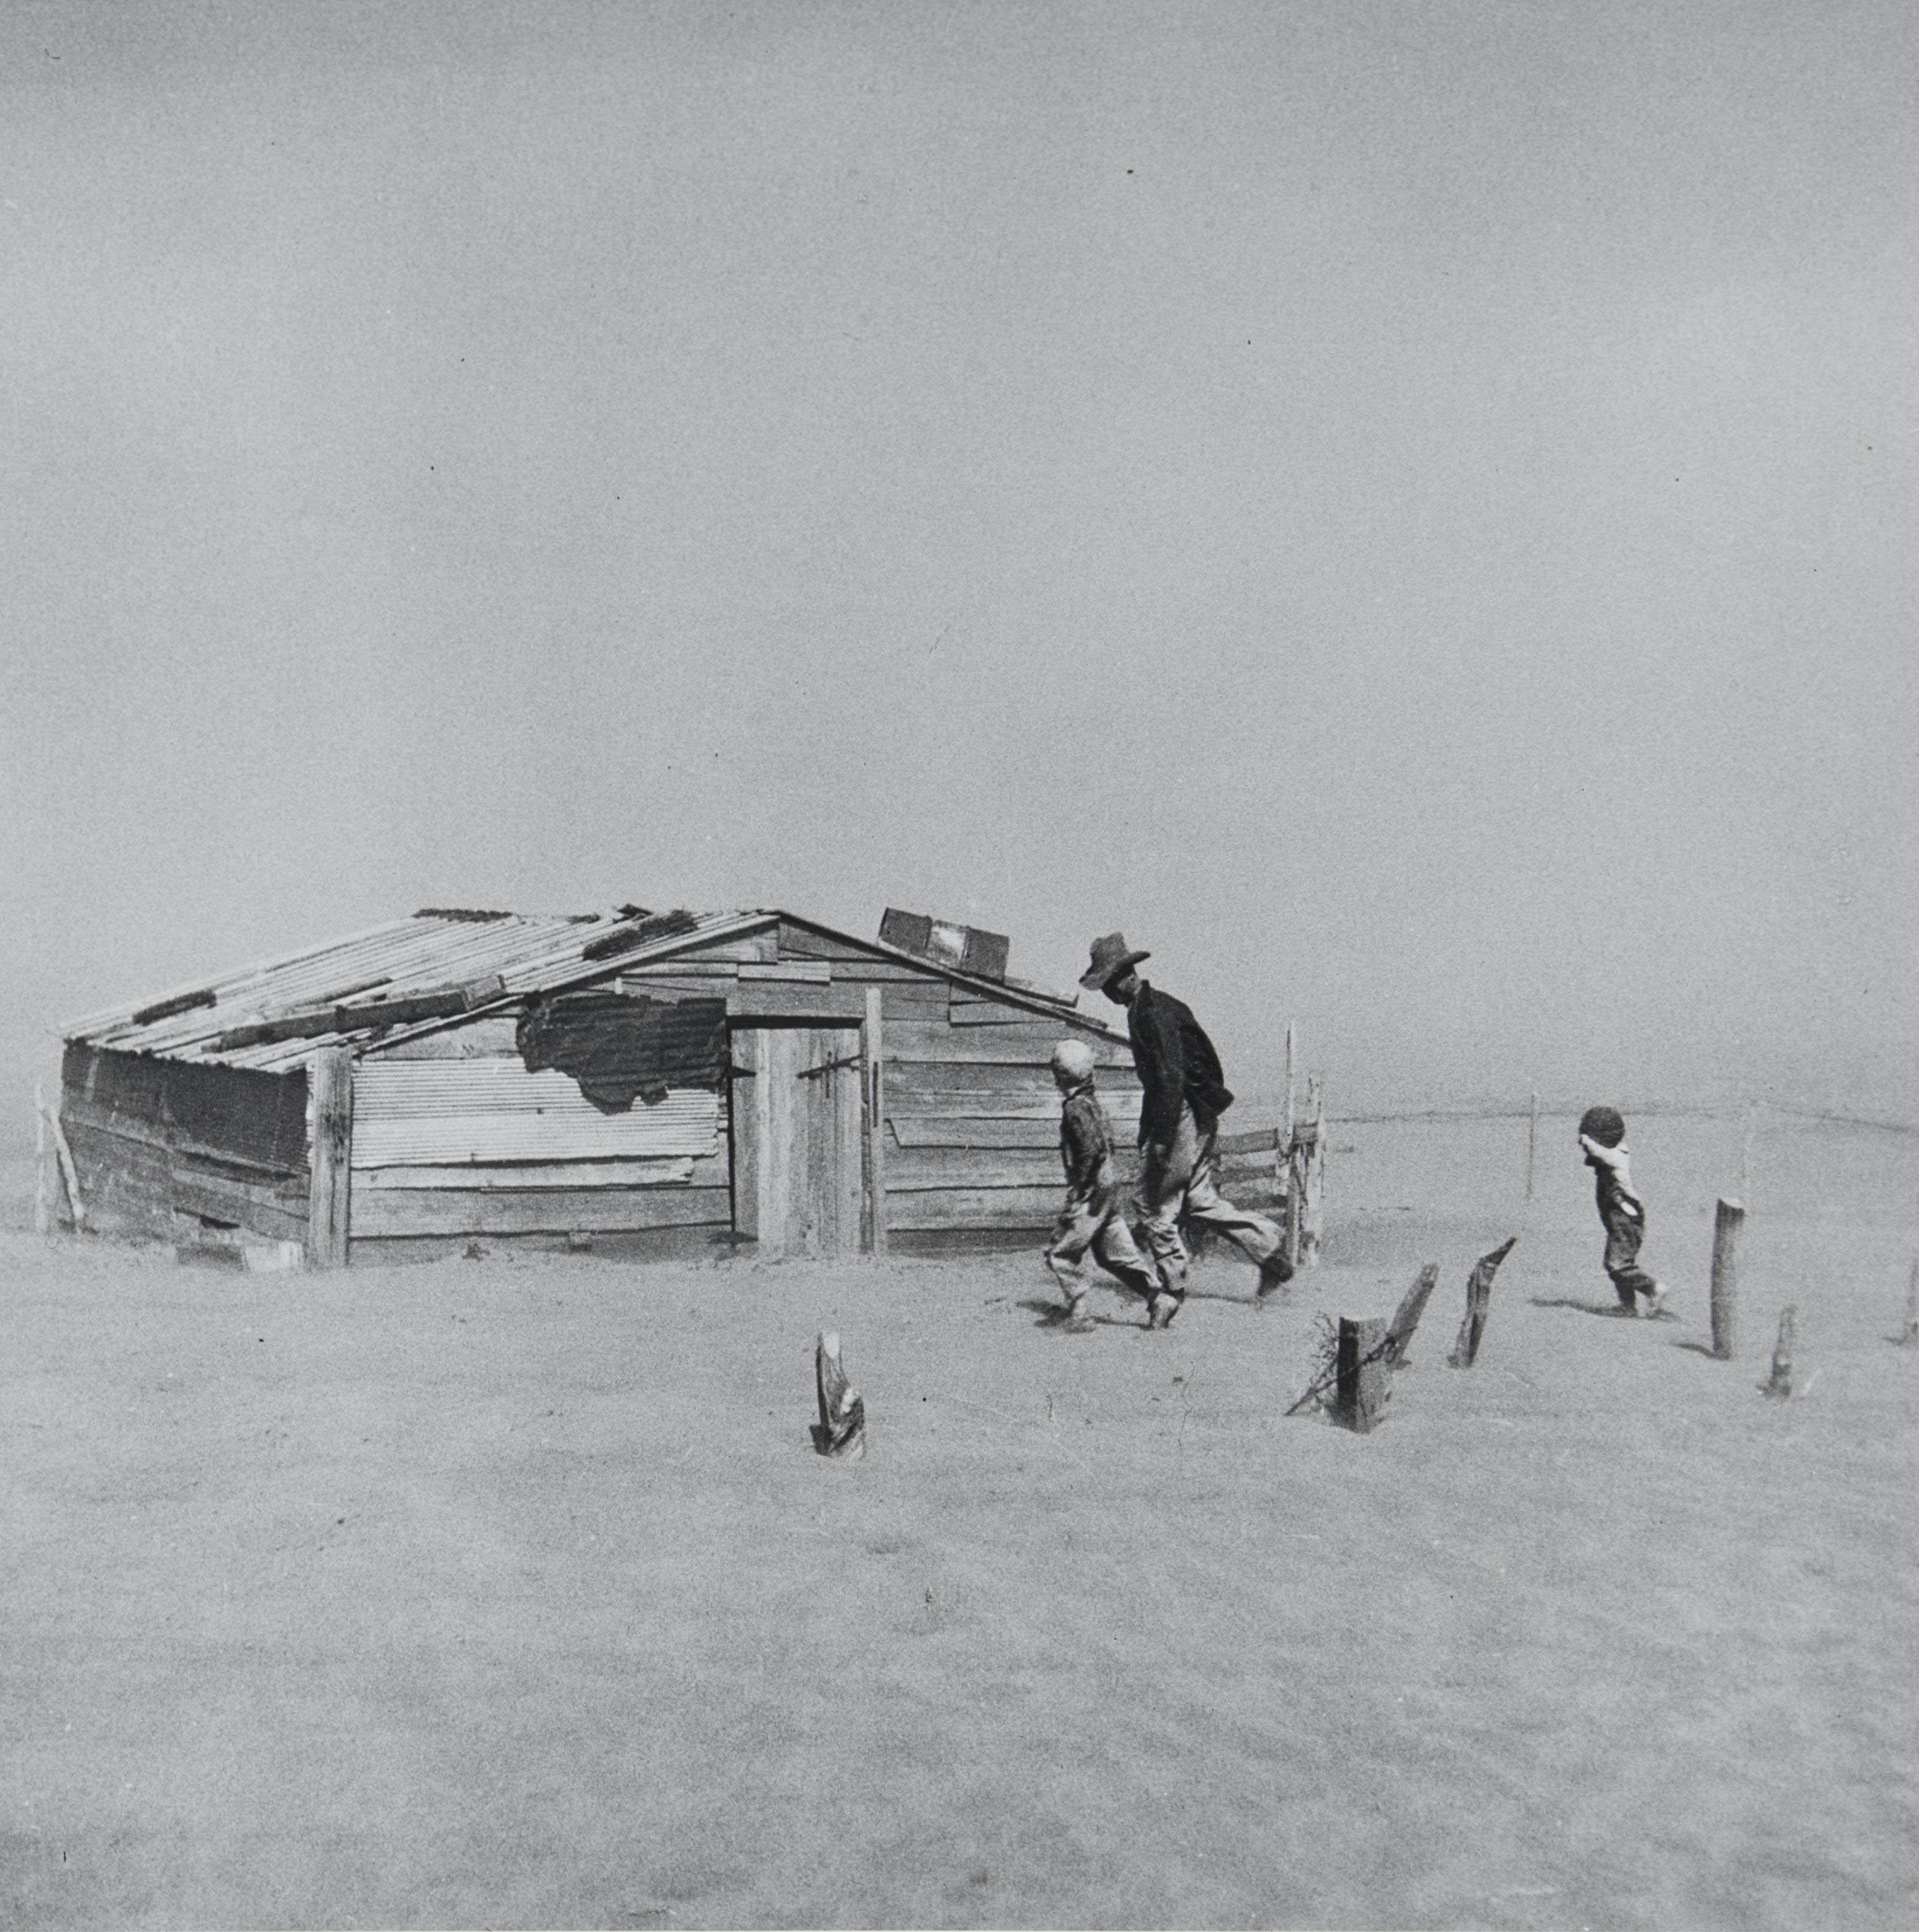 Dust Storm, Oklahoma, 1936